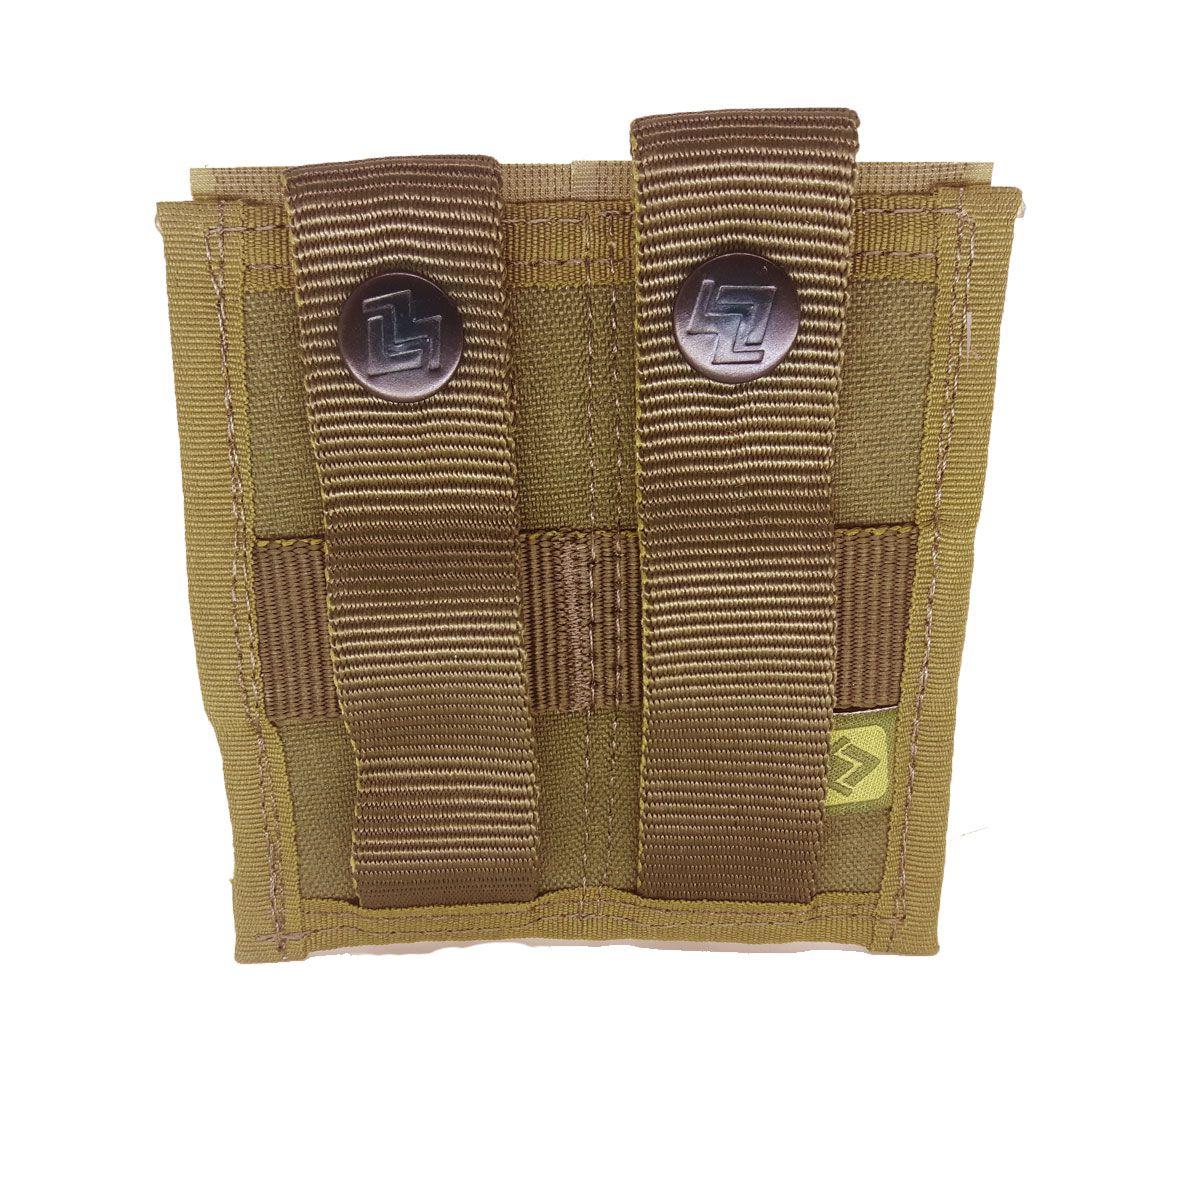 Porta ID Warfare Breve e Patchs Modular 10/10